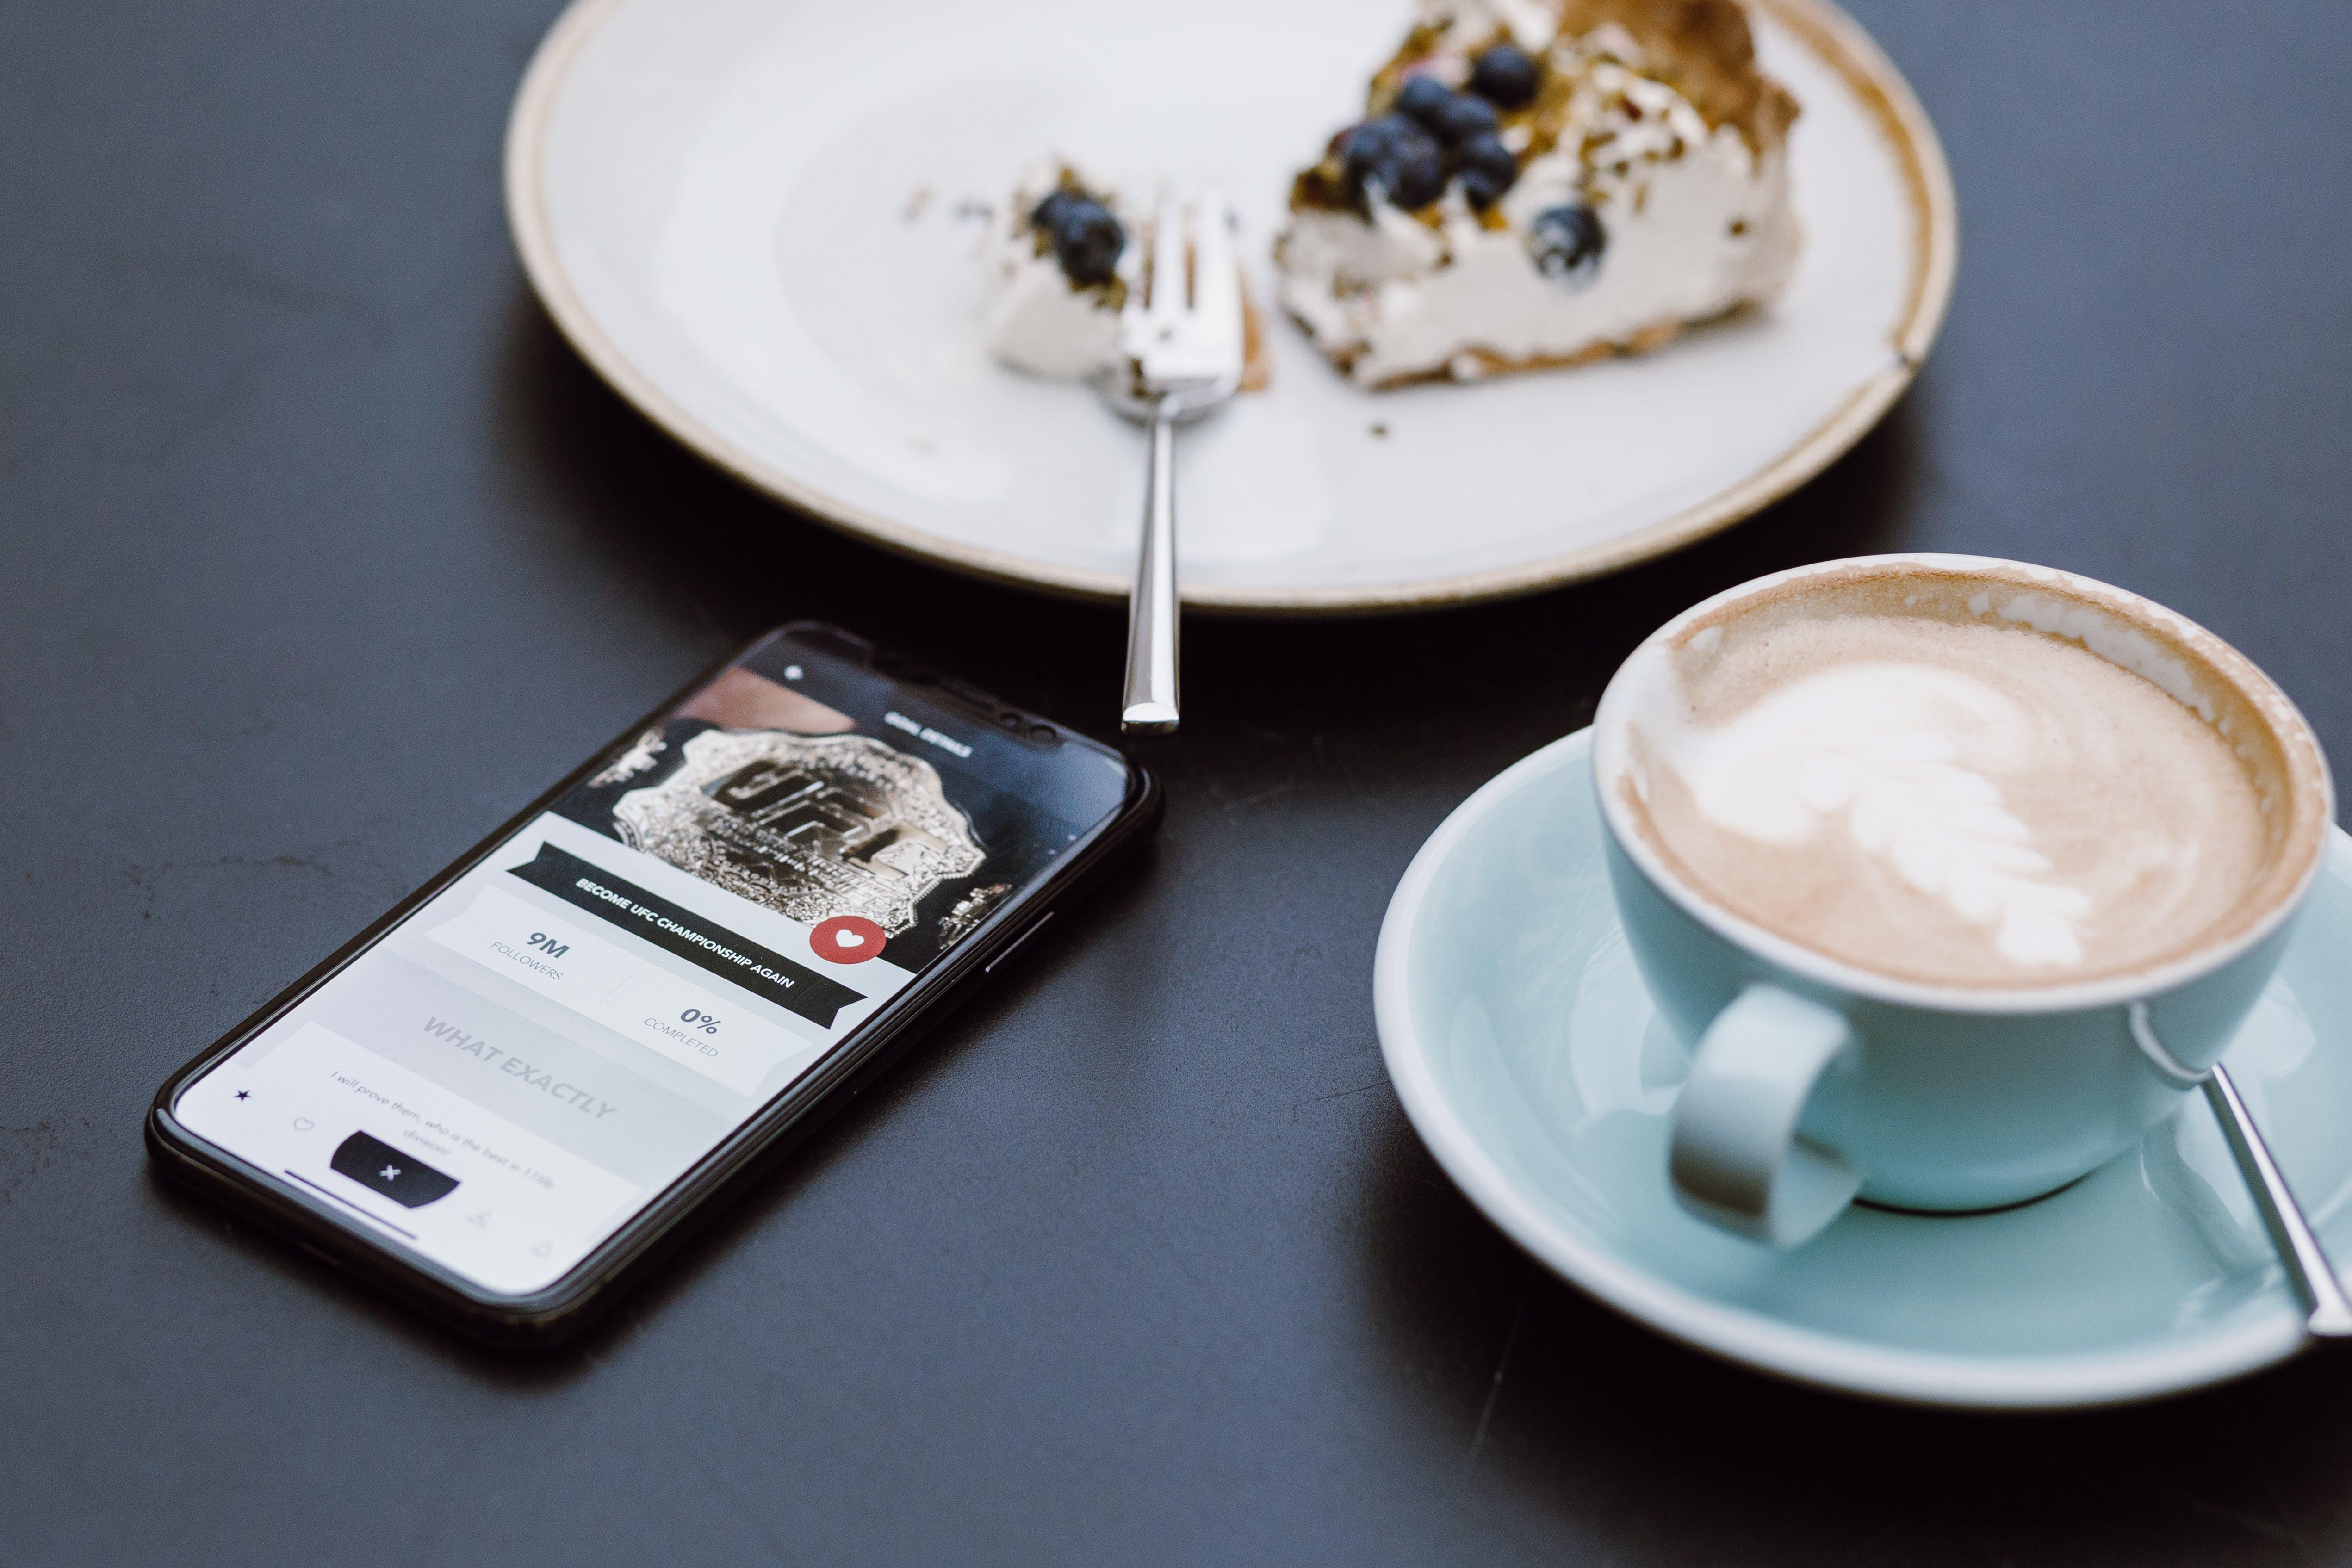 Black Smartphone Beside Coffee Mug in Shallow Focus Lens